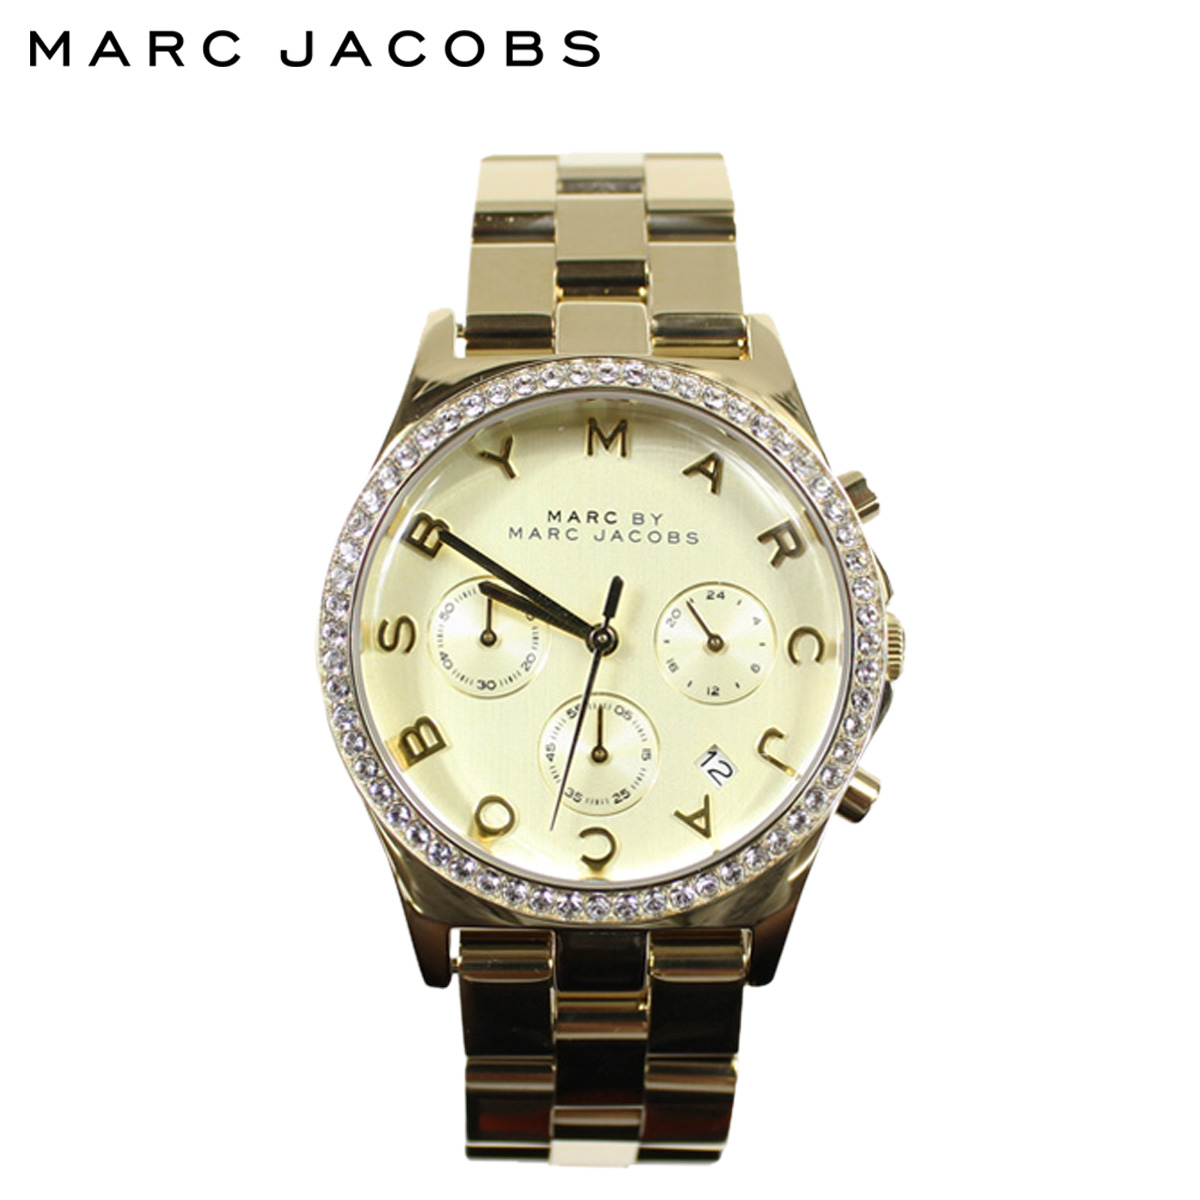 sneak online shop rakuten global market point 2 x mark by mark point 2 x mark by mark jacobs marc by marc jacobs watches men women 38 mm